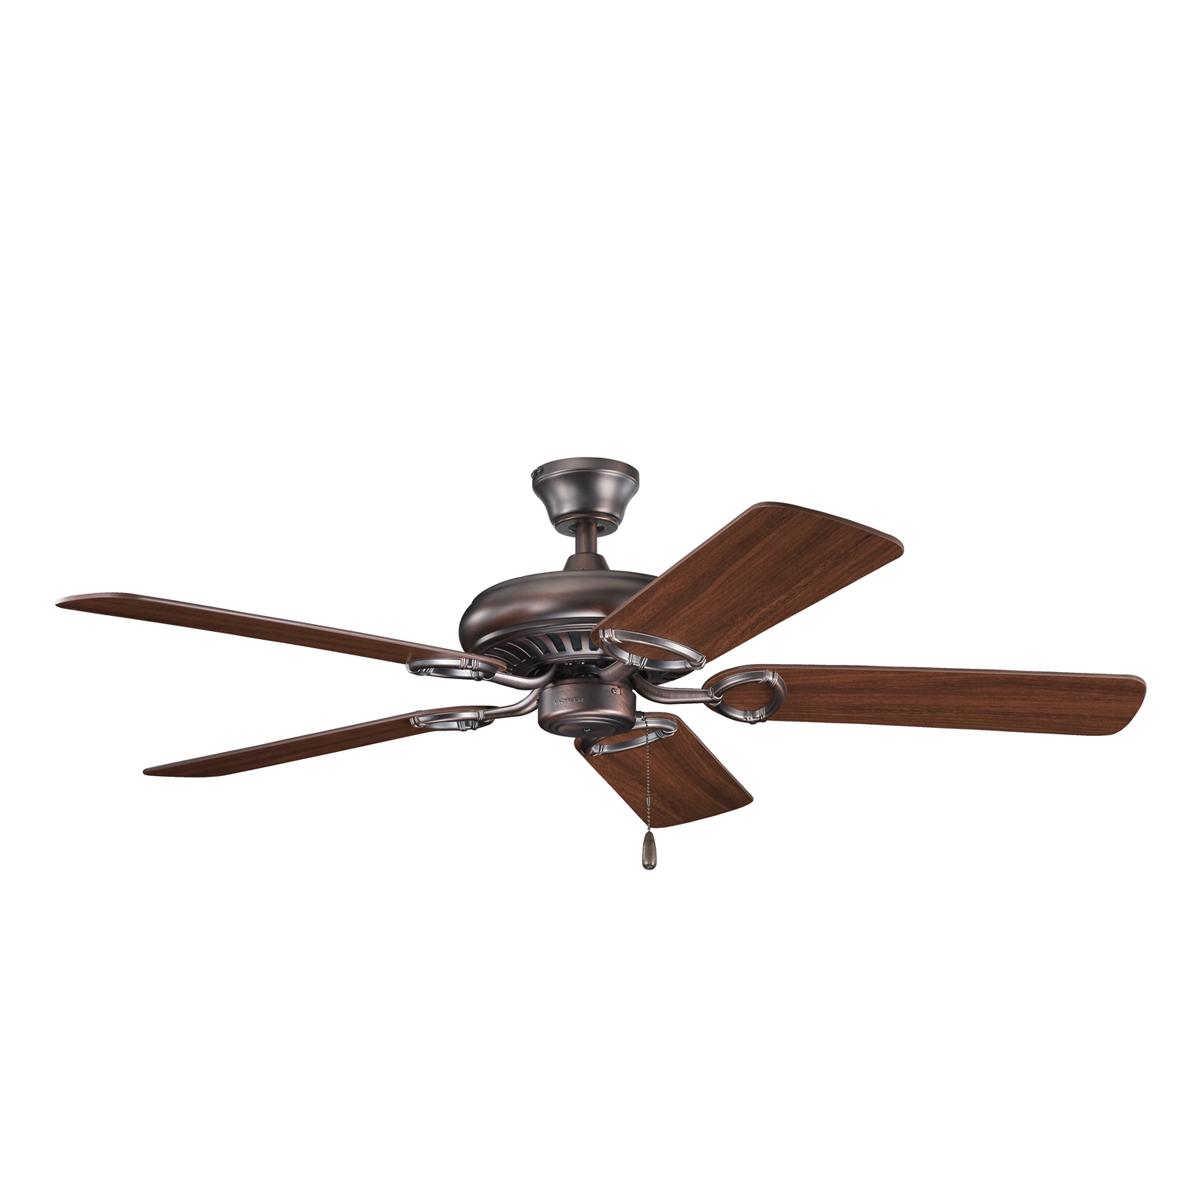 Kichler 339011OBB Oil Brushed Bronze Ceiling Fan From